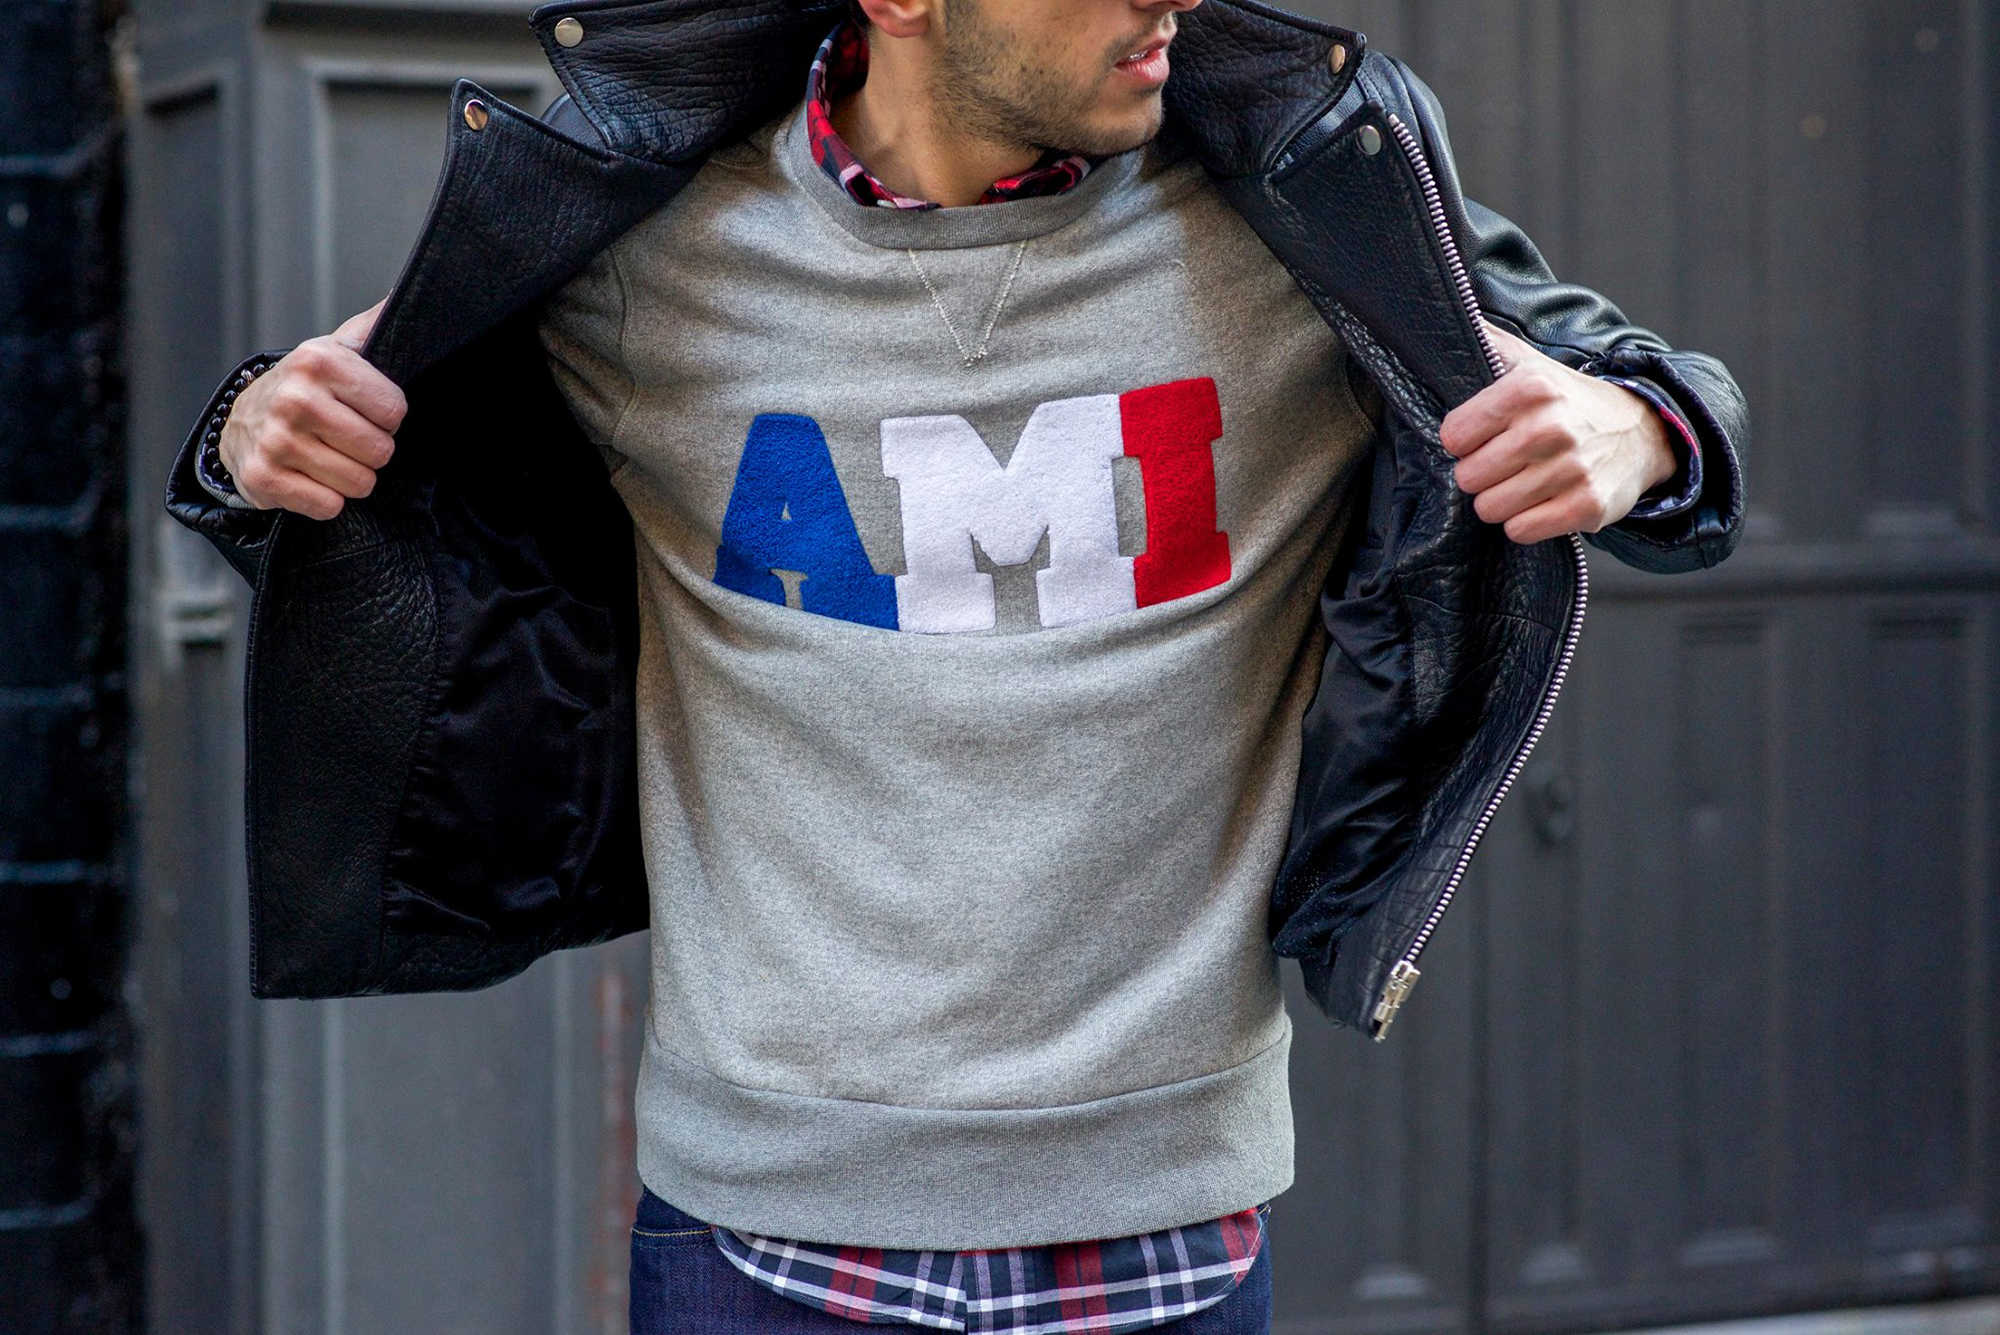 French menswear brand AMI